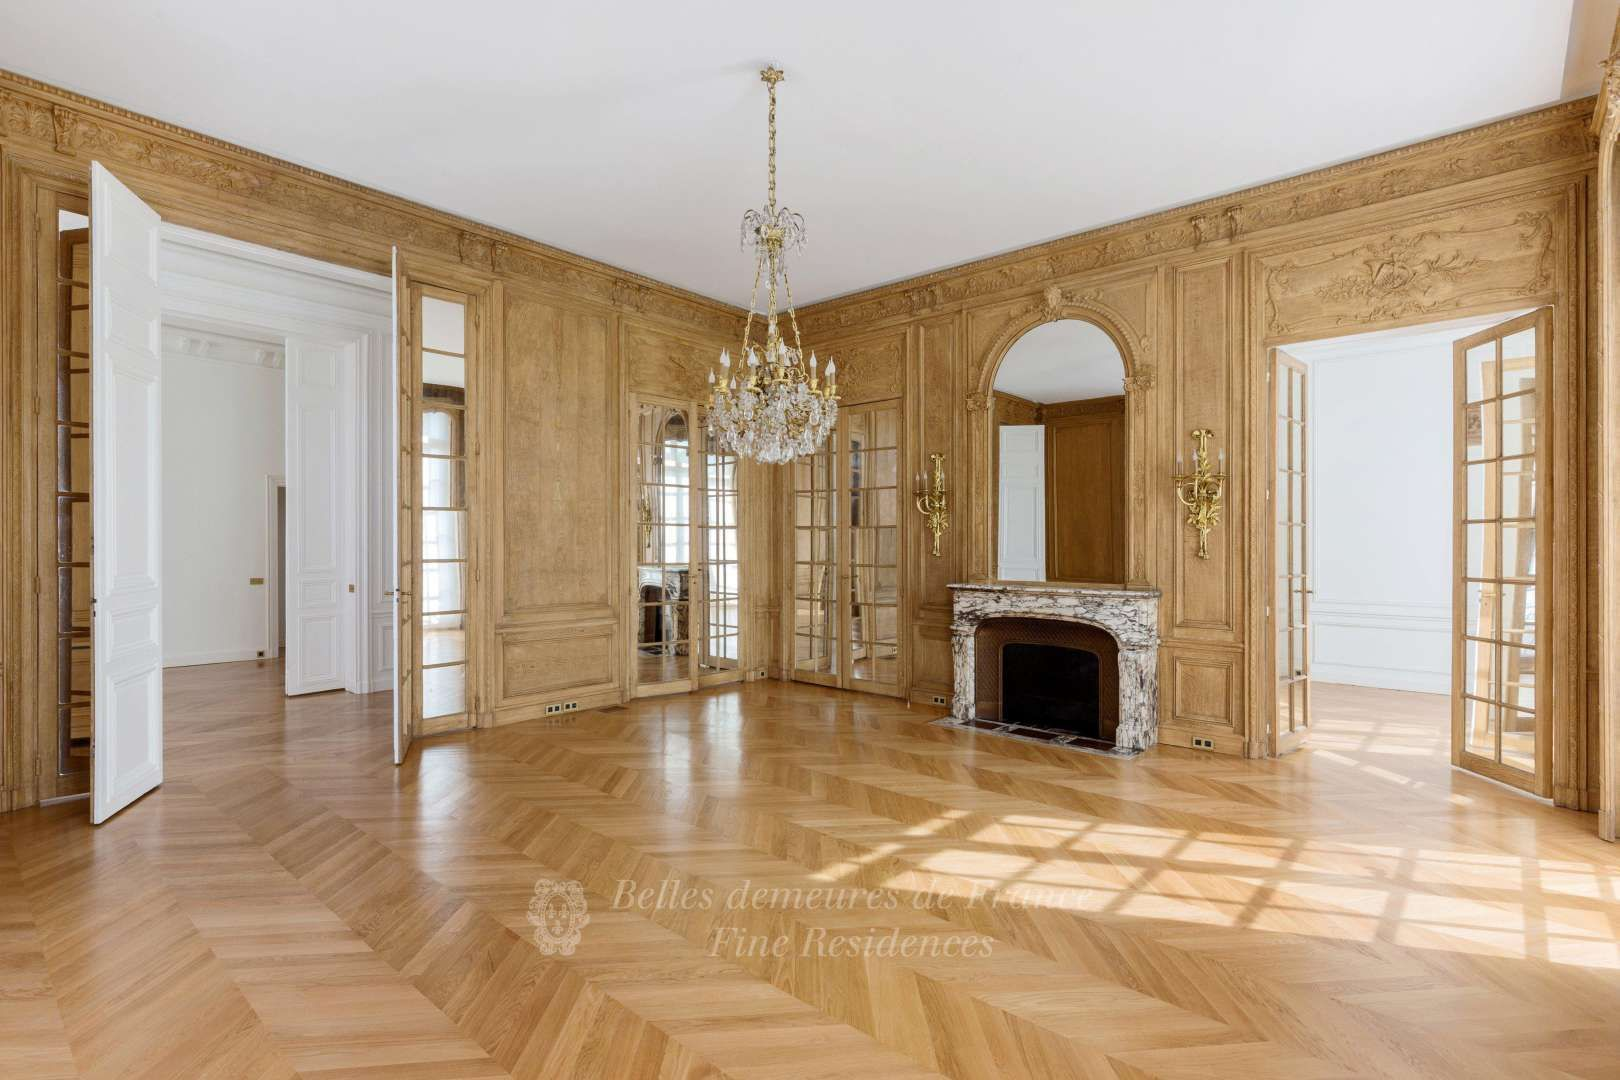 Apartment for sale, Paris 7th (75007), 6 rooms, 248 m² ...